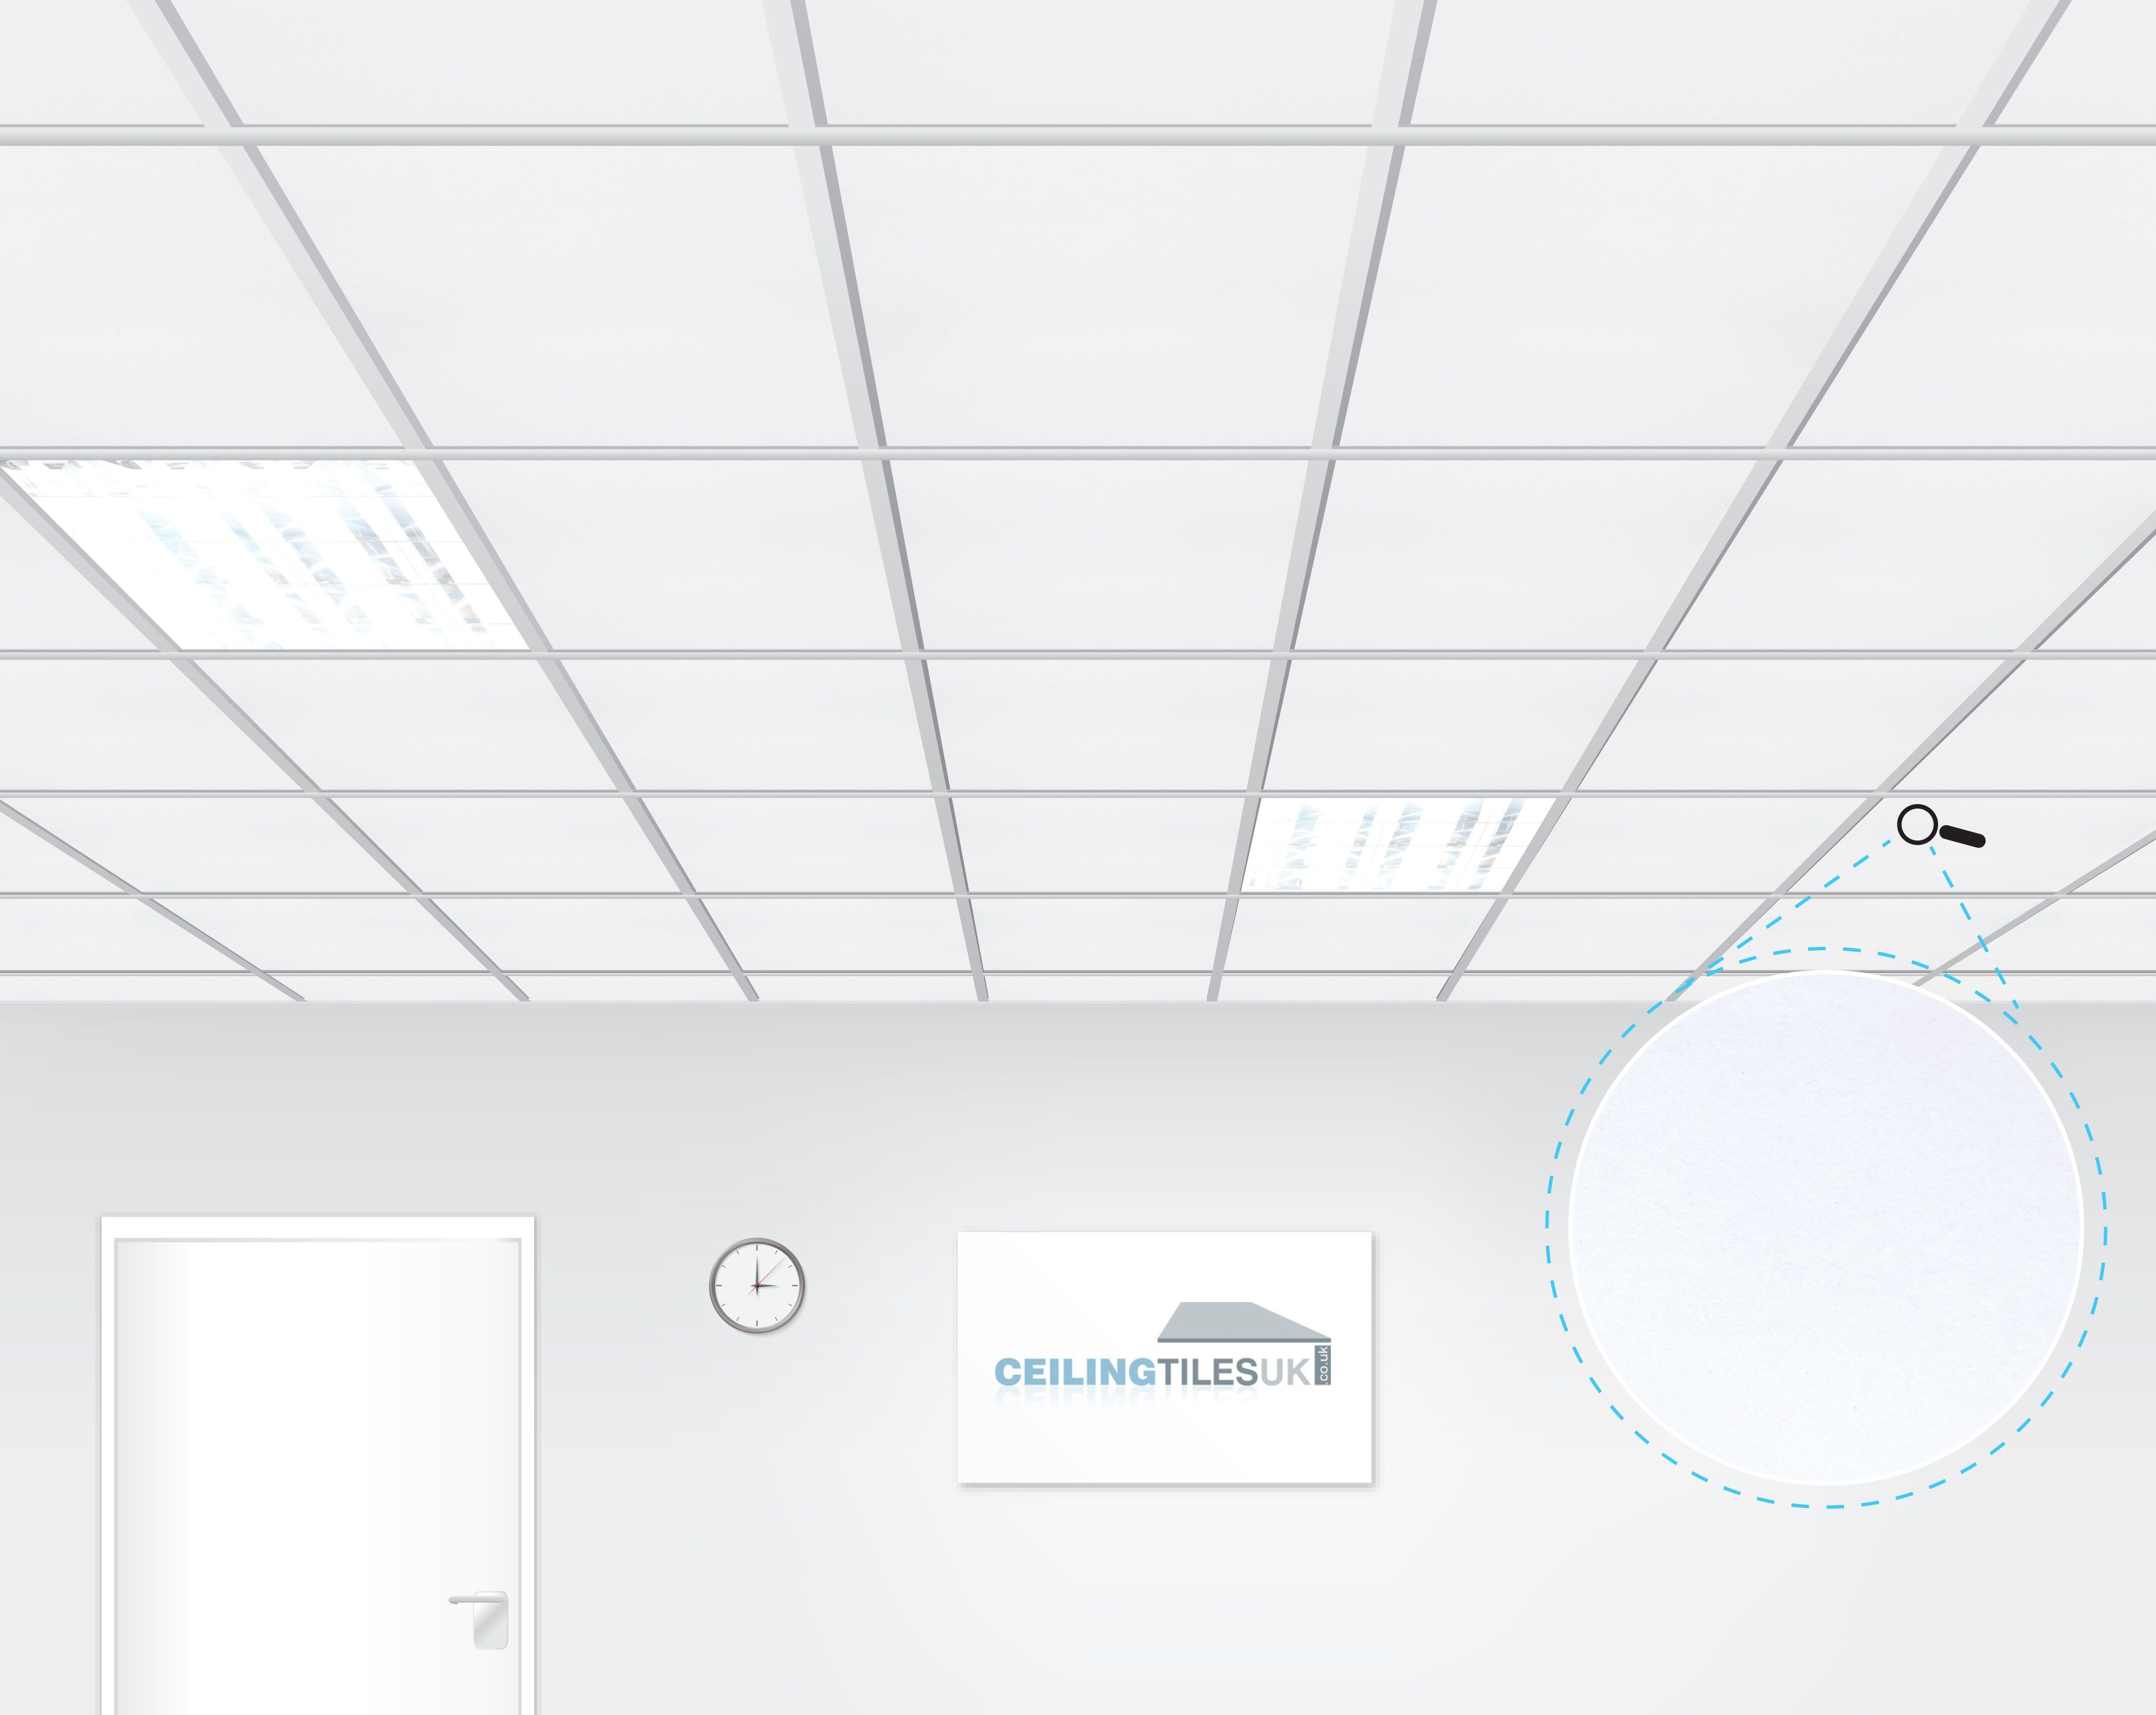 Rockfon Alaska 600x600mm Tegular Suspended Ceiling Ceiling Tiles